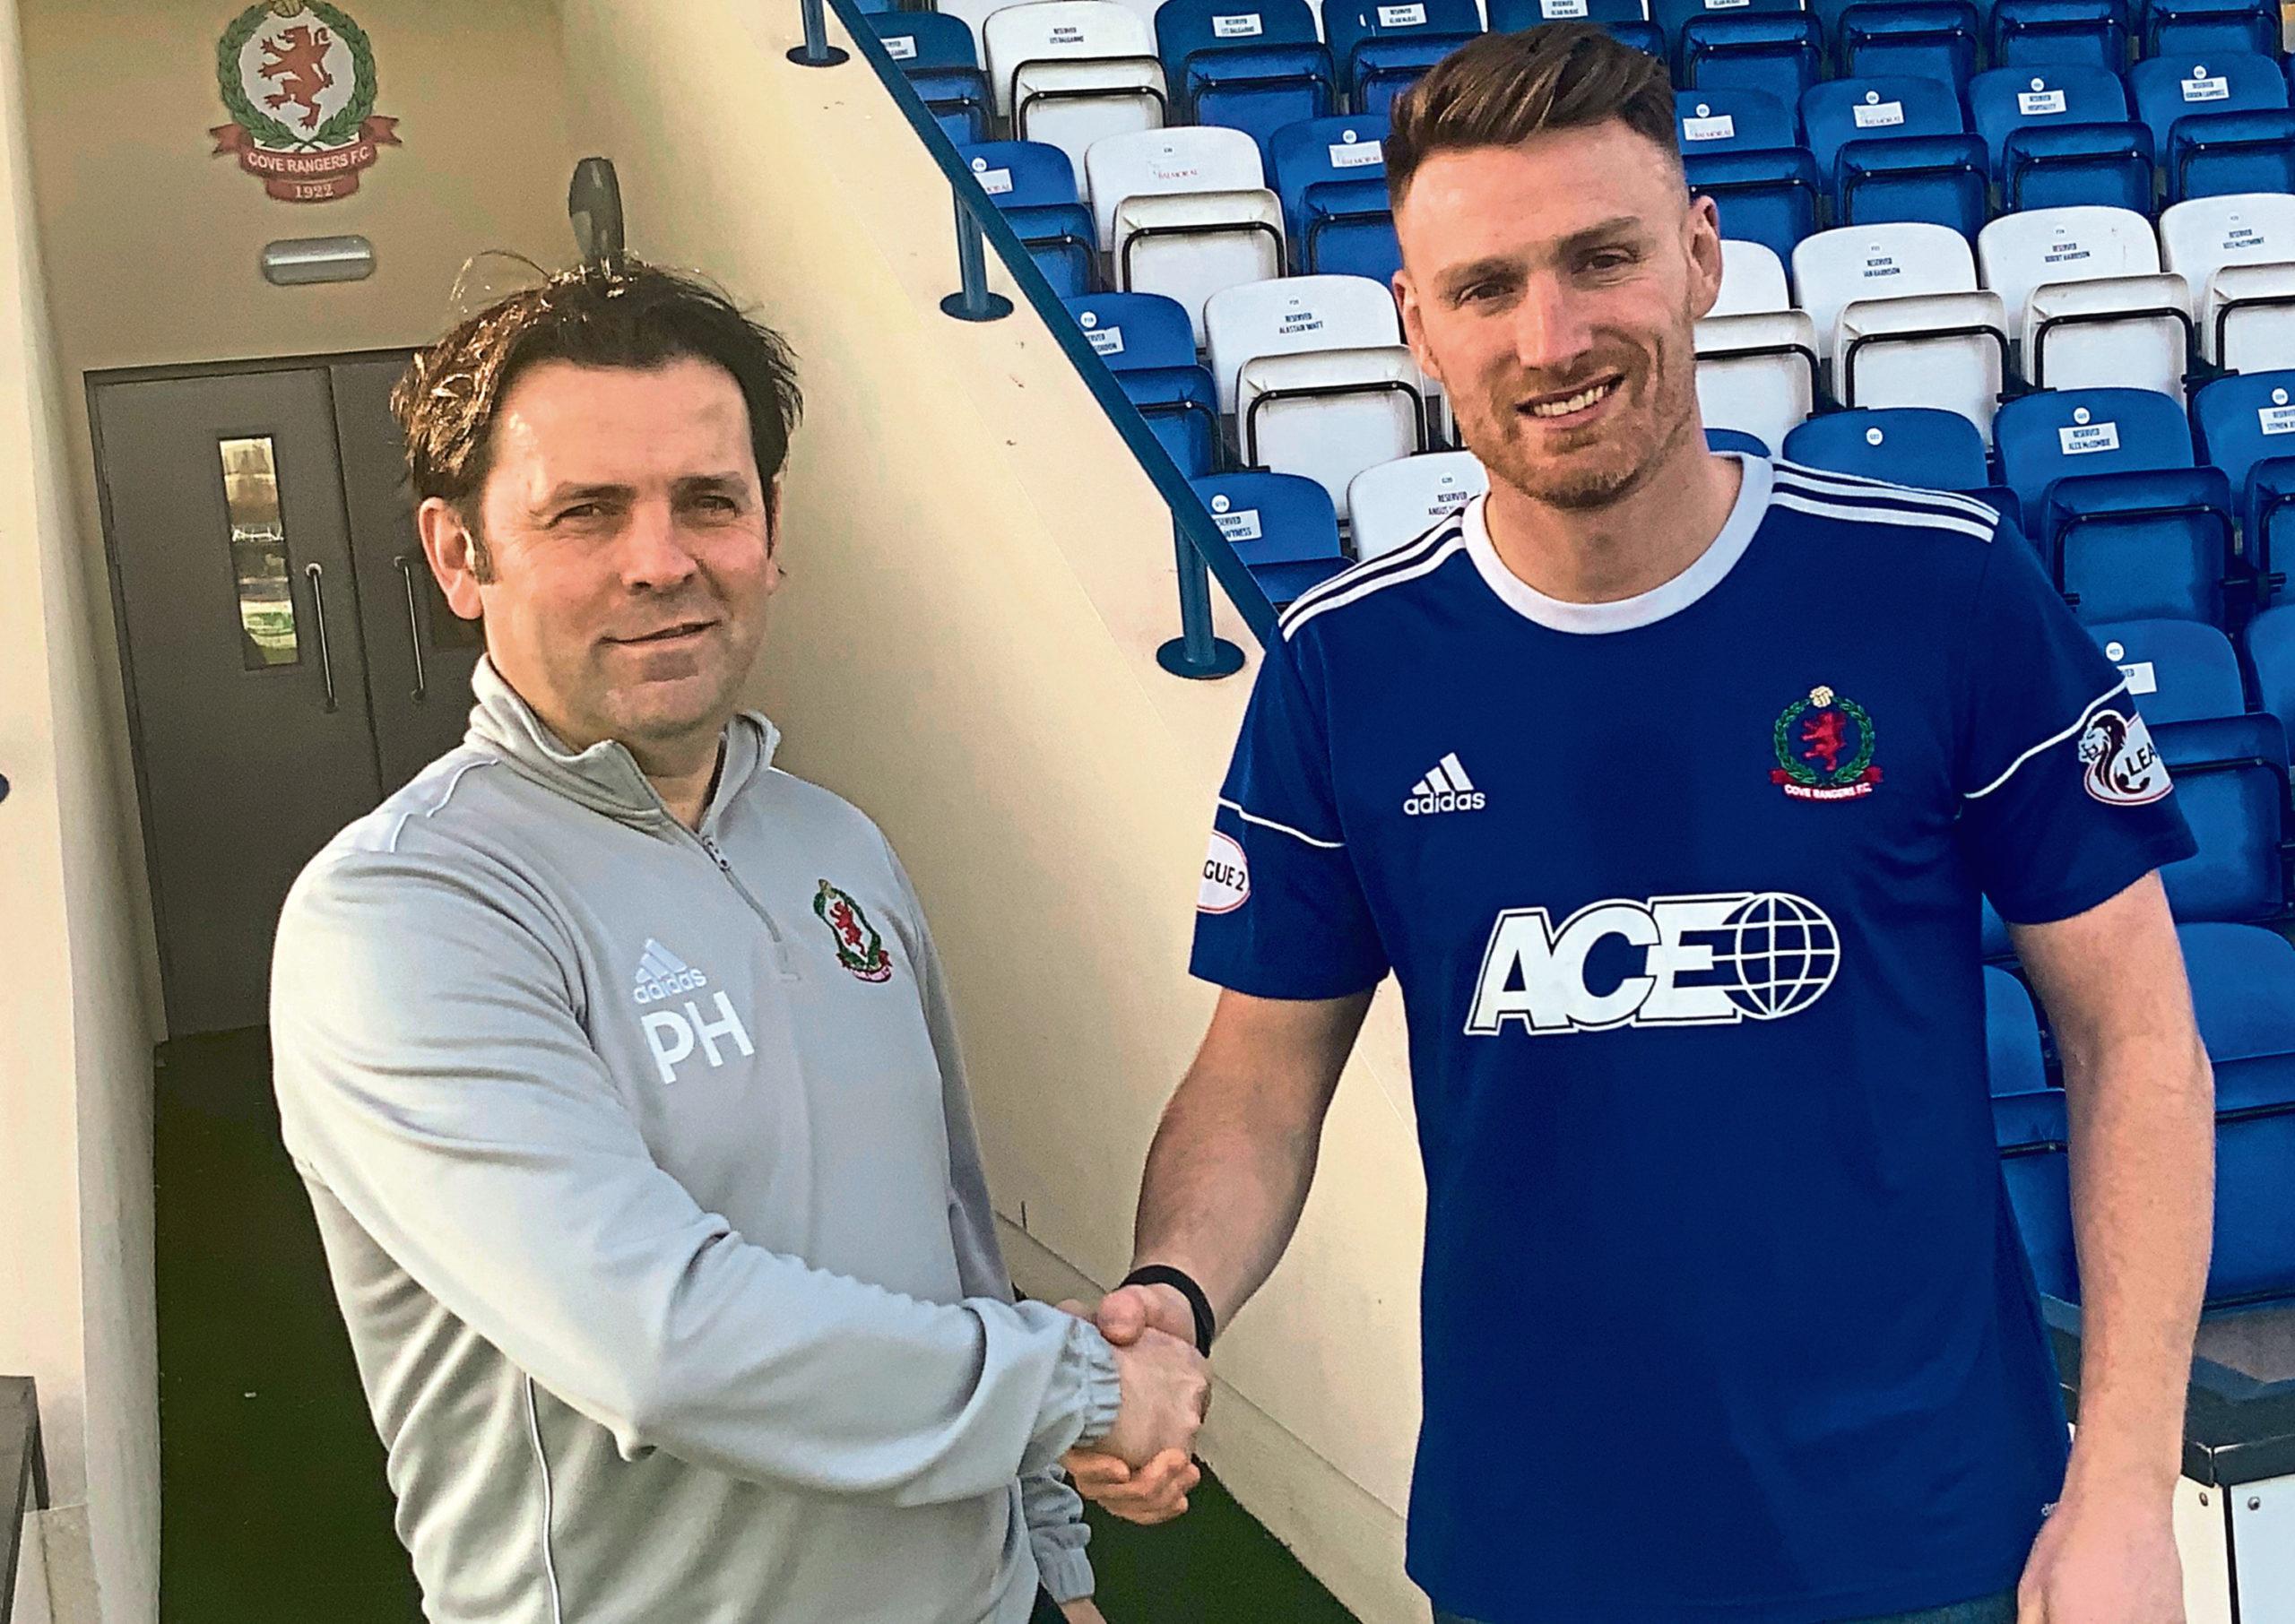 Cove Rangers boss Paul Hartley added striker Rory McAllister for the second half of last season.